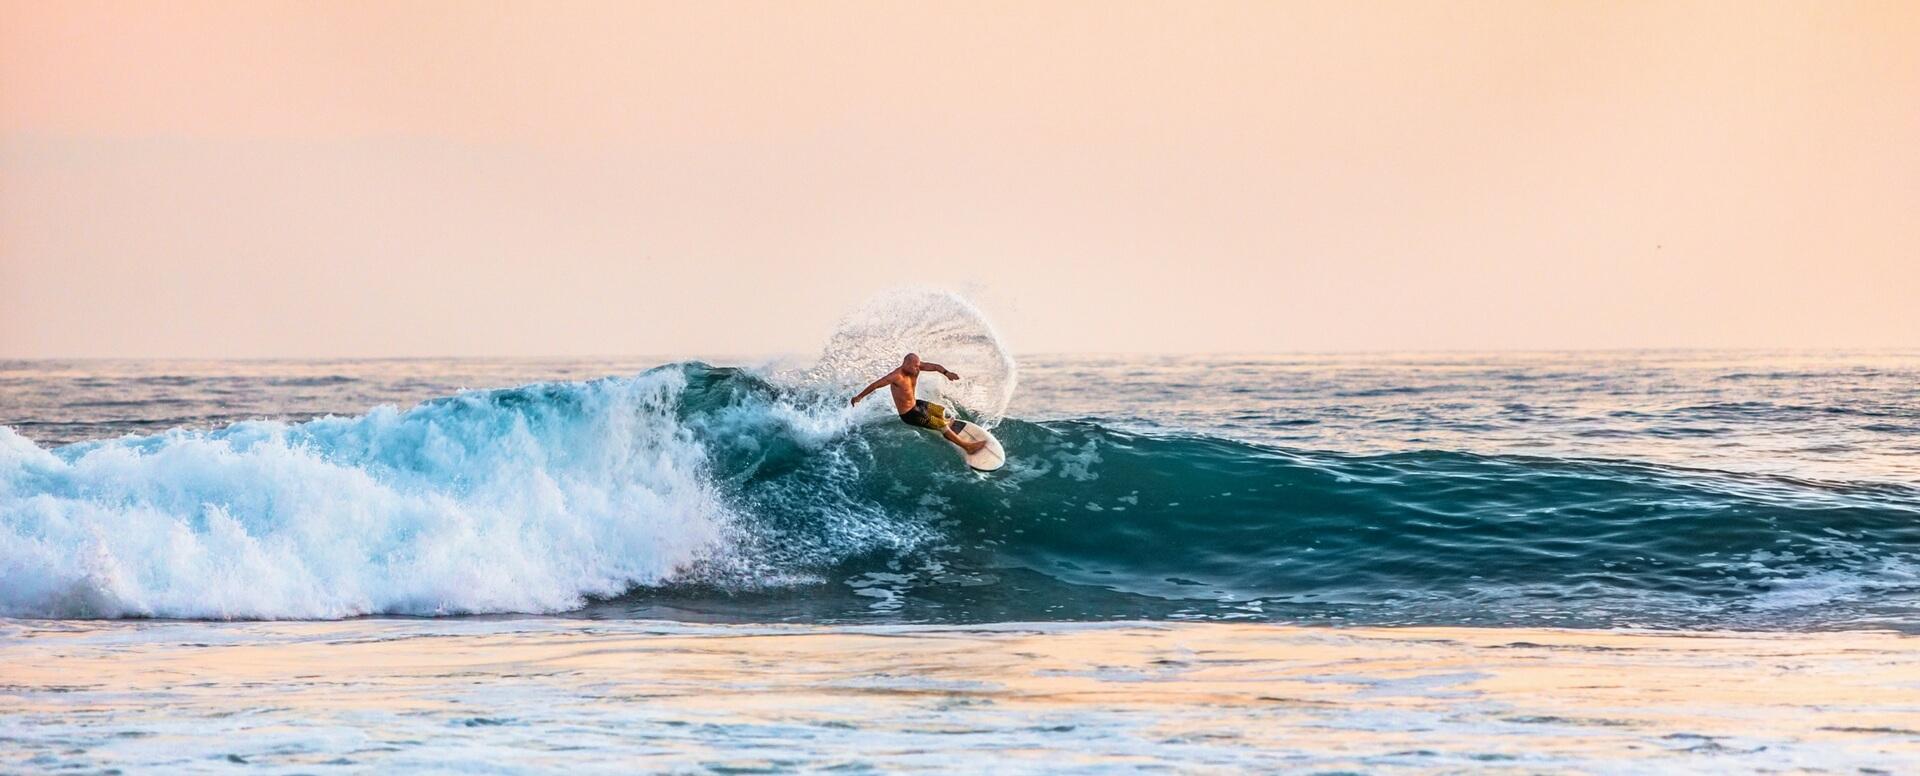 2- Faites du surf sur Kuta Beach - Bali